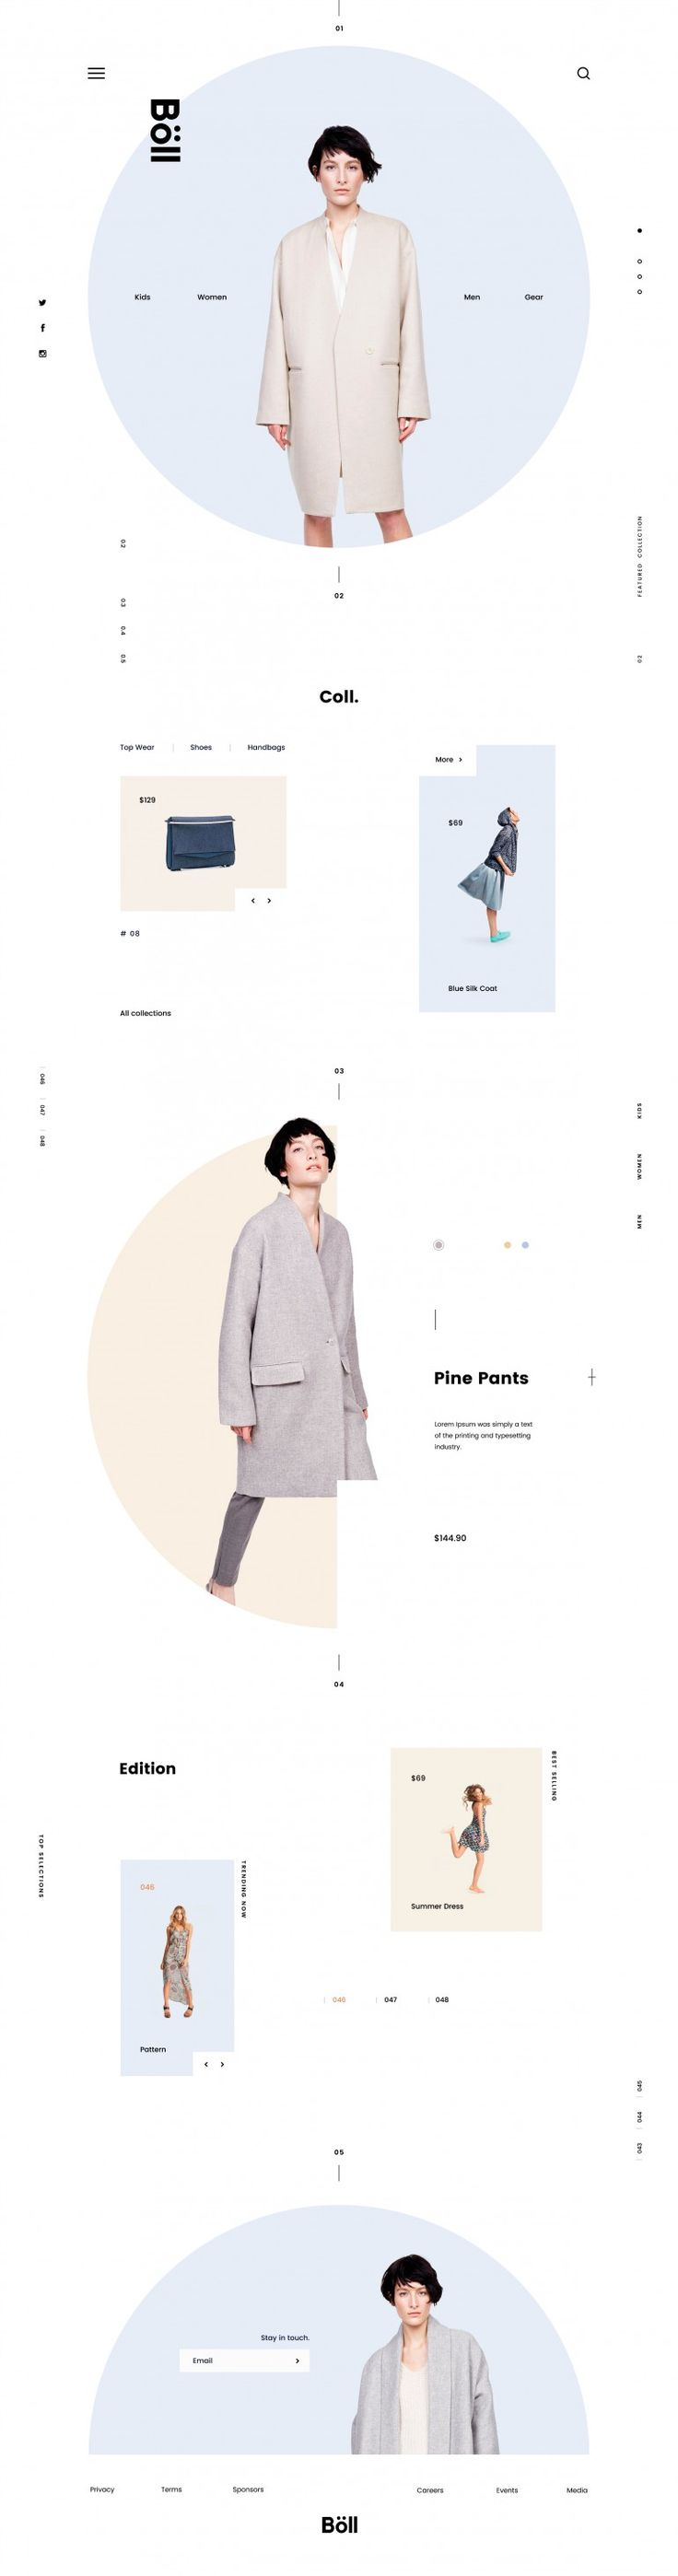 Böll Fashion E-commerce Website